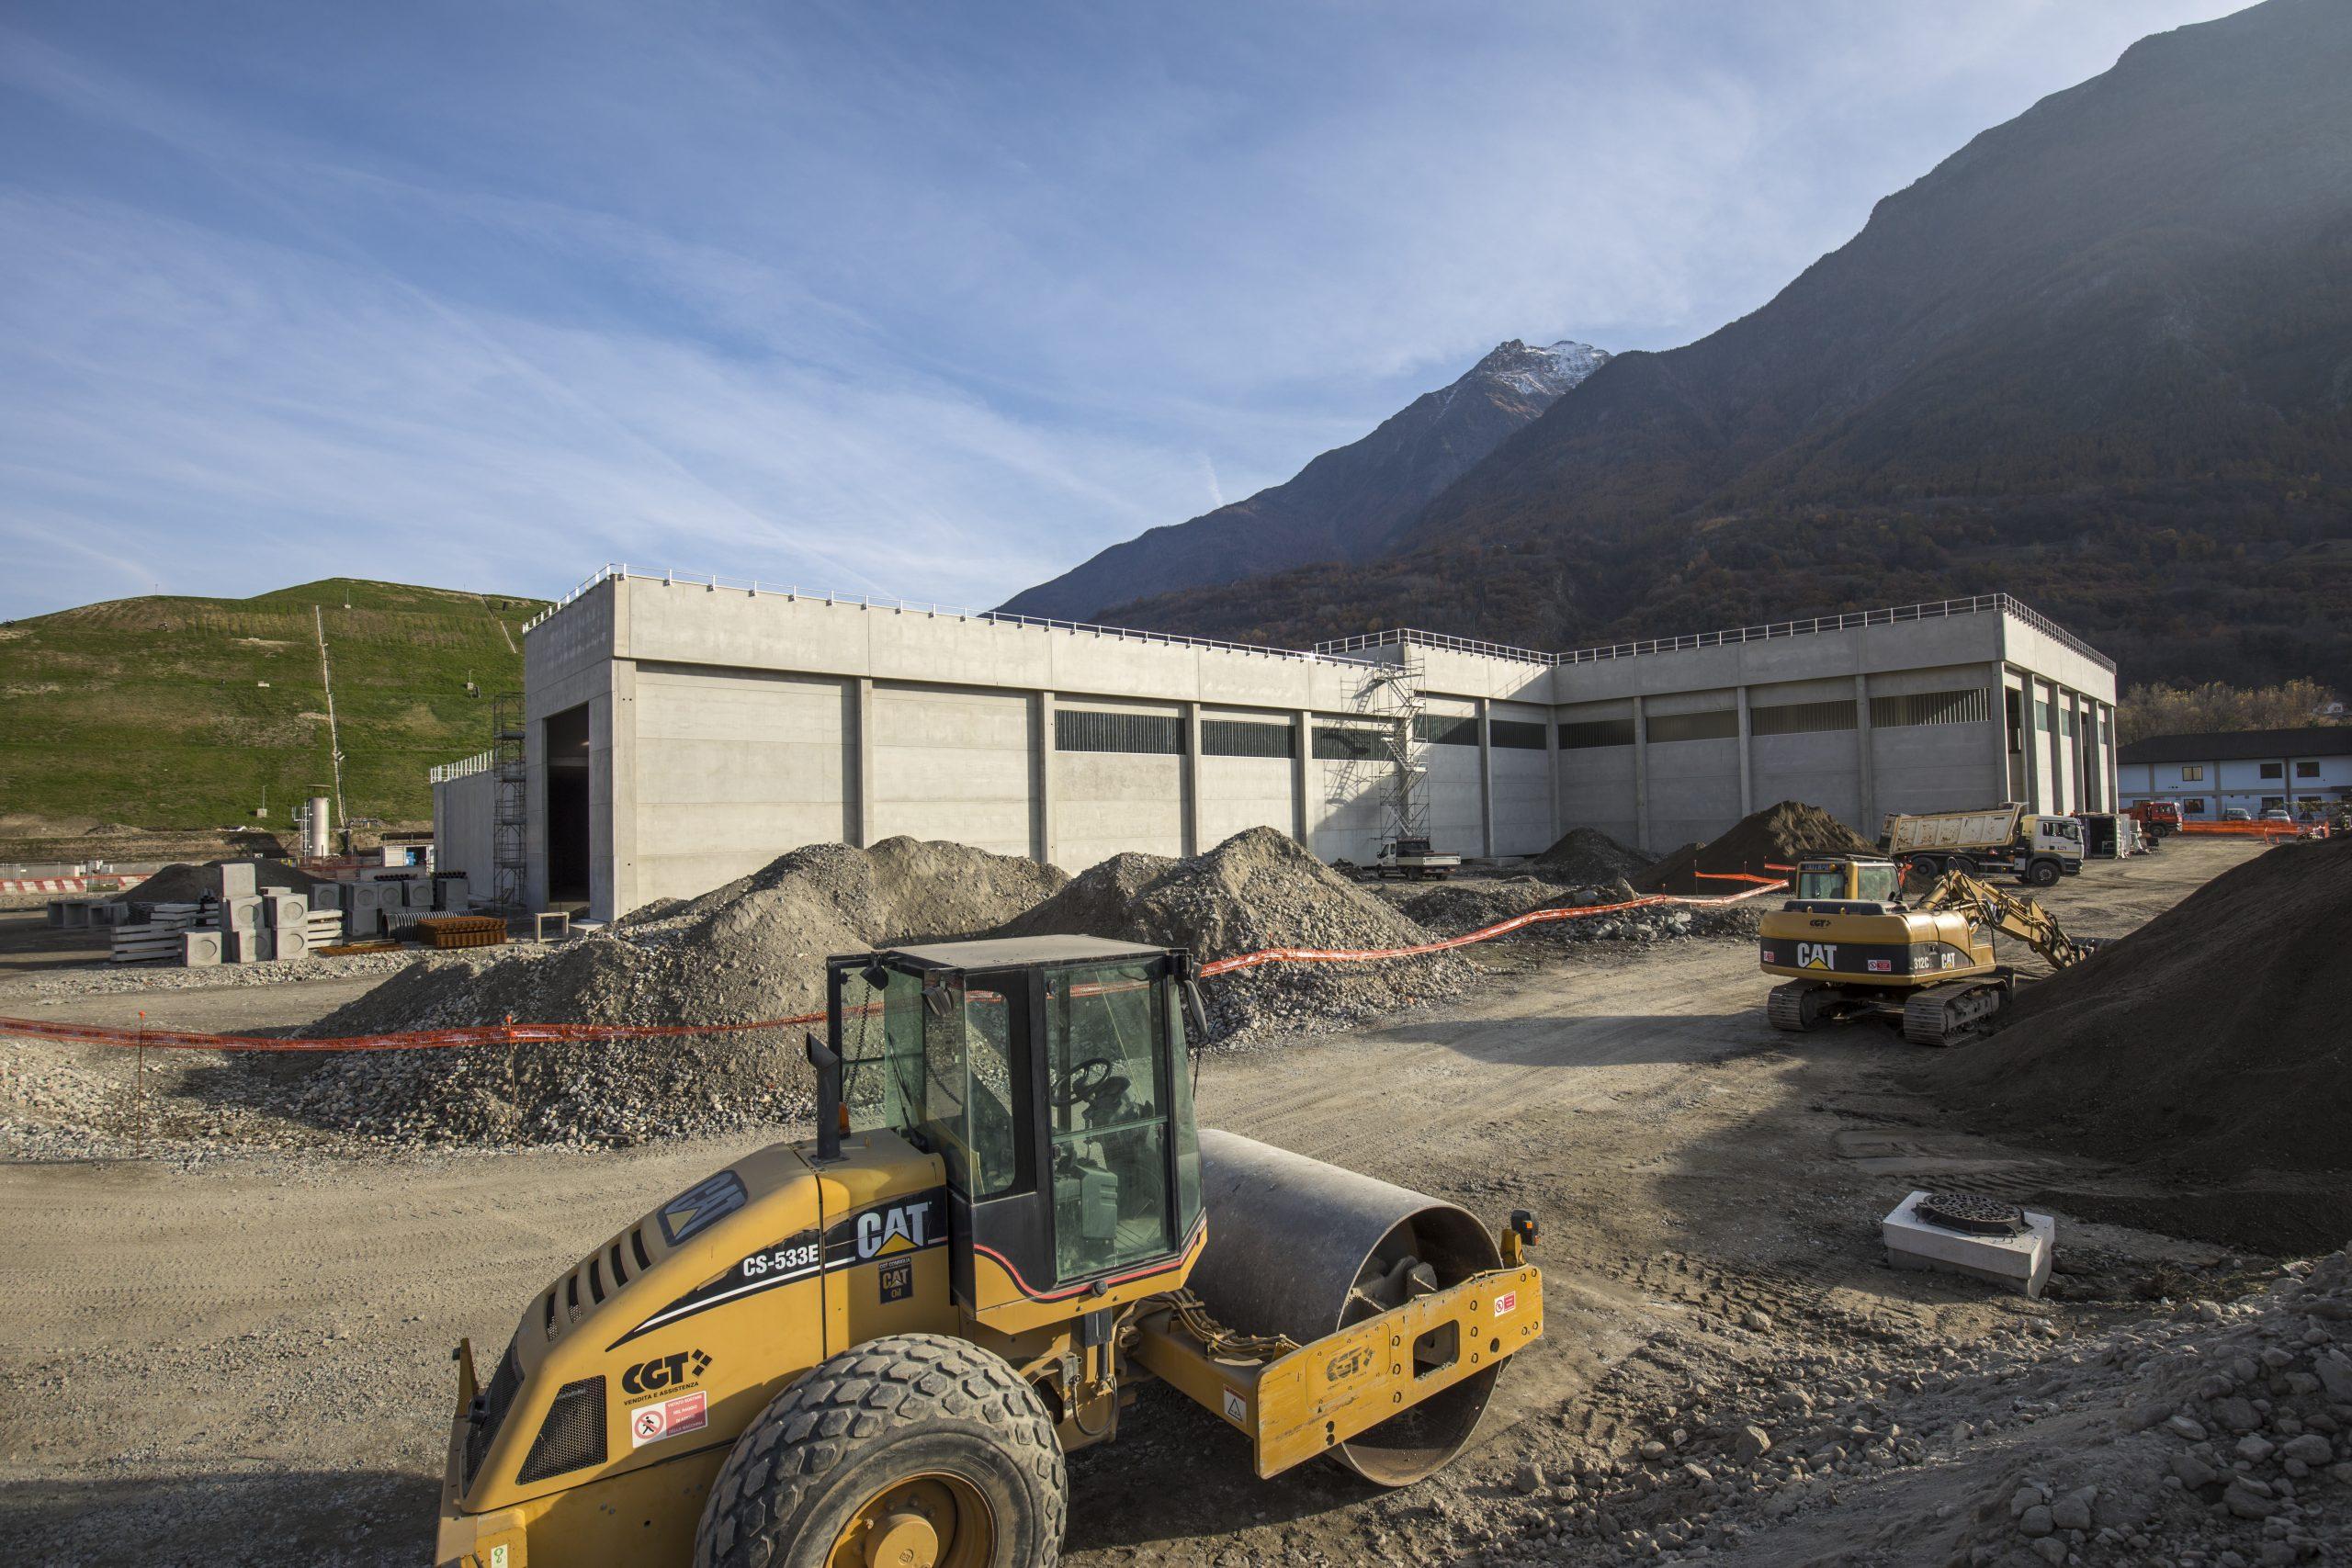 Discarica Aosta_13-11-2020_PH Stefano Jeantet-43